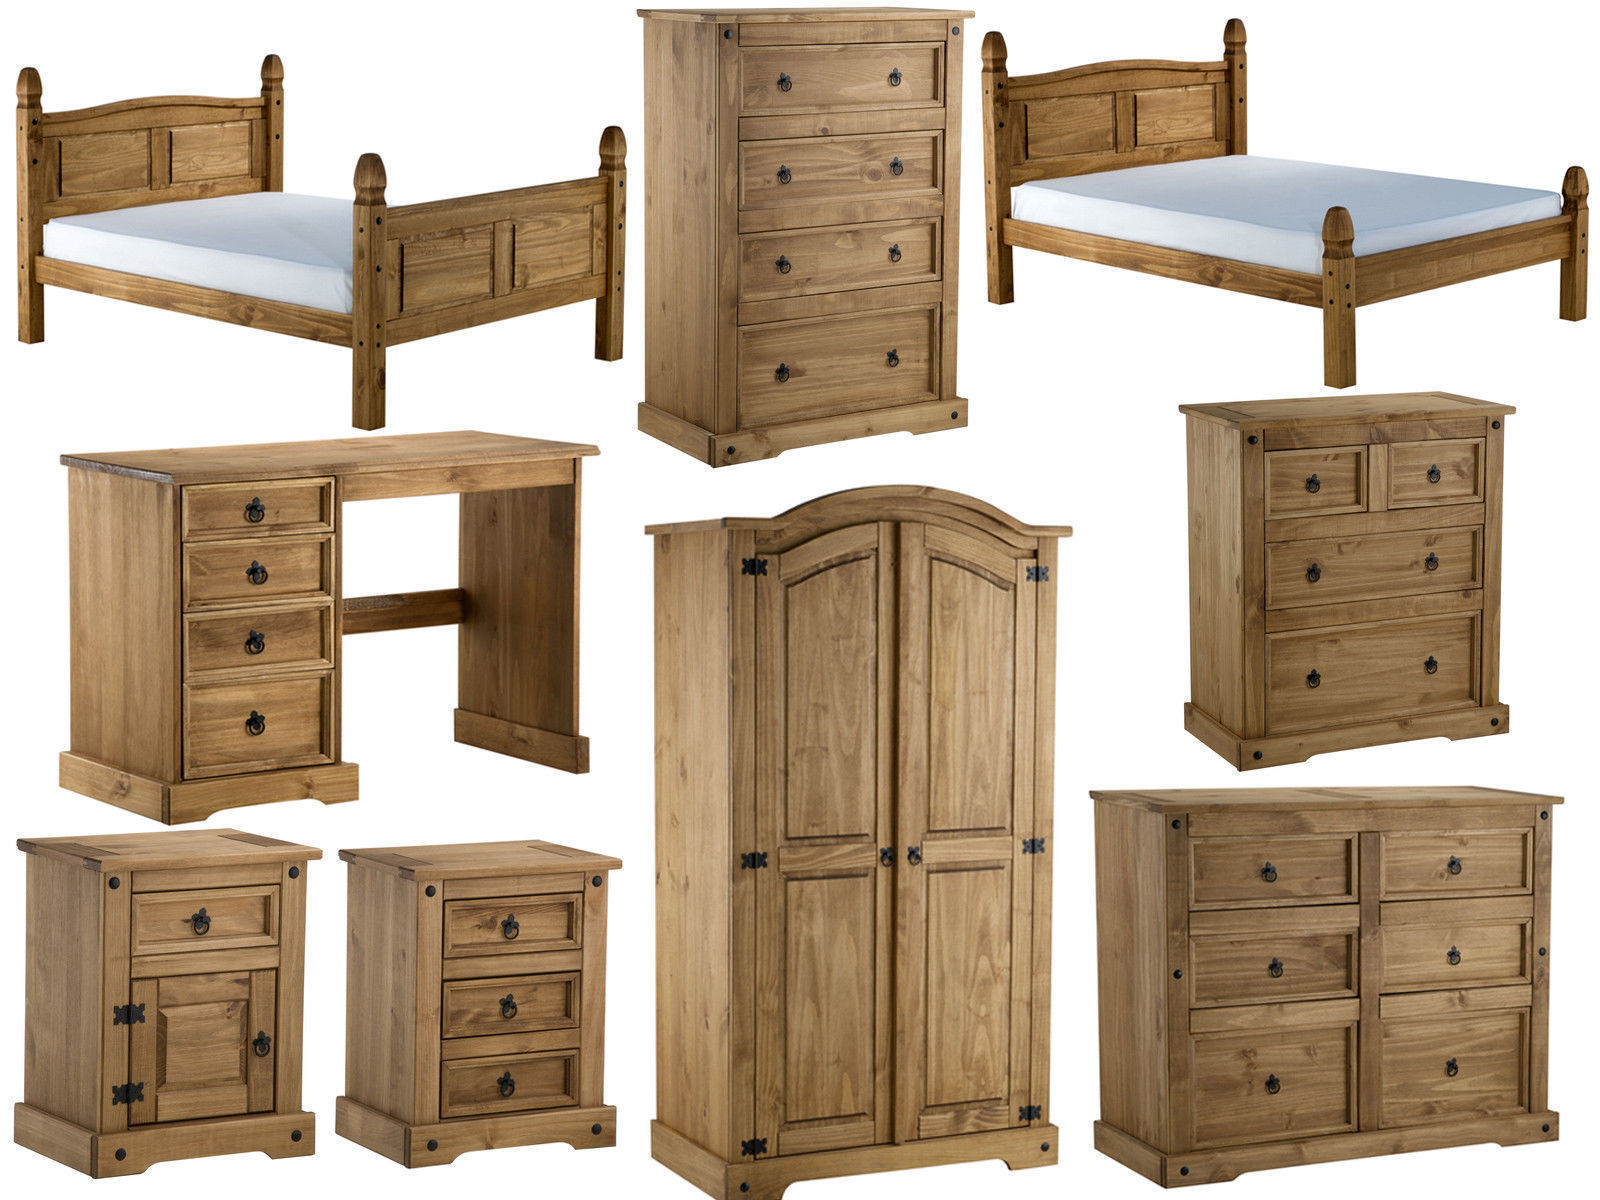 Birlea corona pine bedroom furniture distressed waxed for Pine bedroom furniture